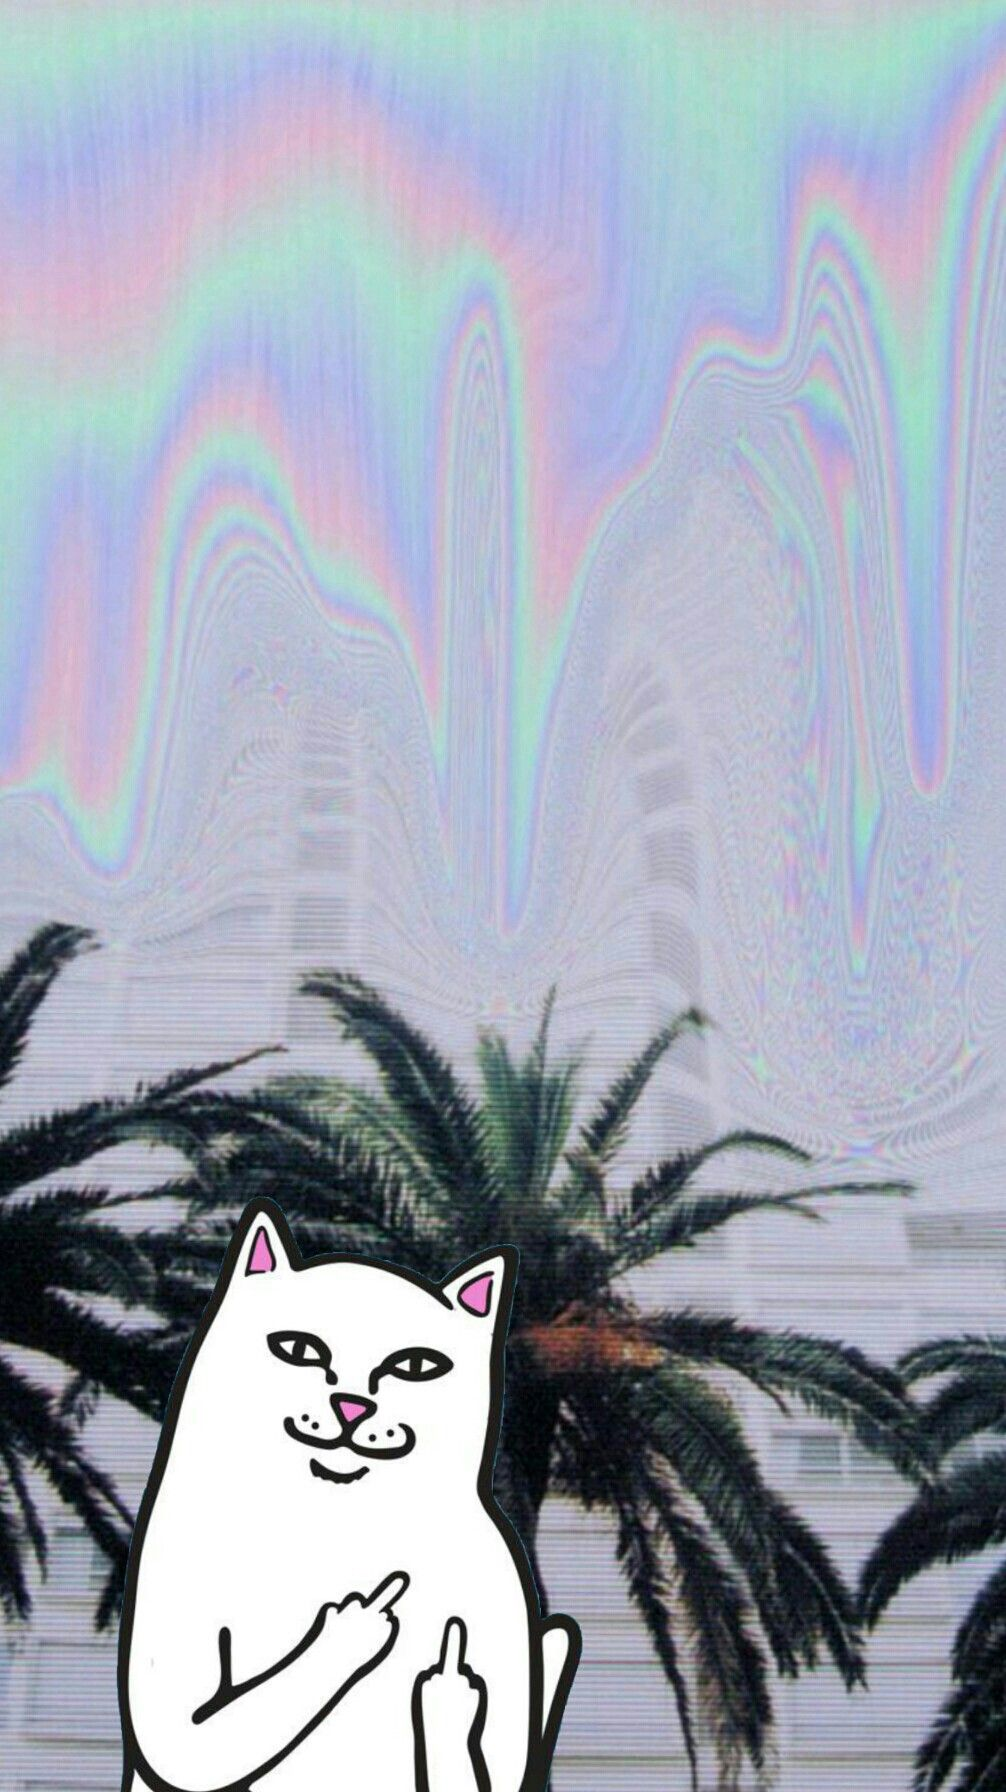 Versace iphone wallpaper tumblr - Ripndip Iphone Wallpaper Ripndip Middle Finger Cat Wallpaper Iphone